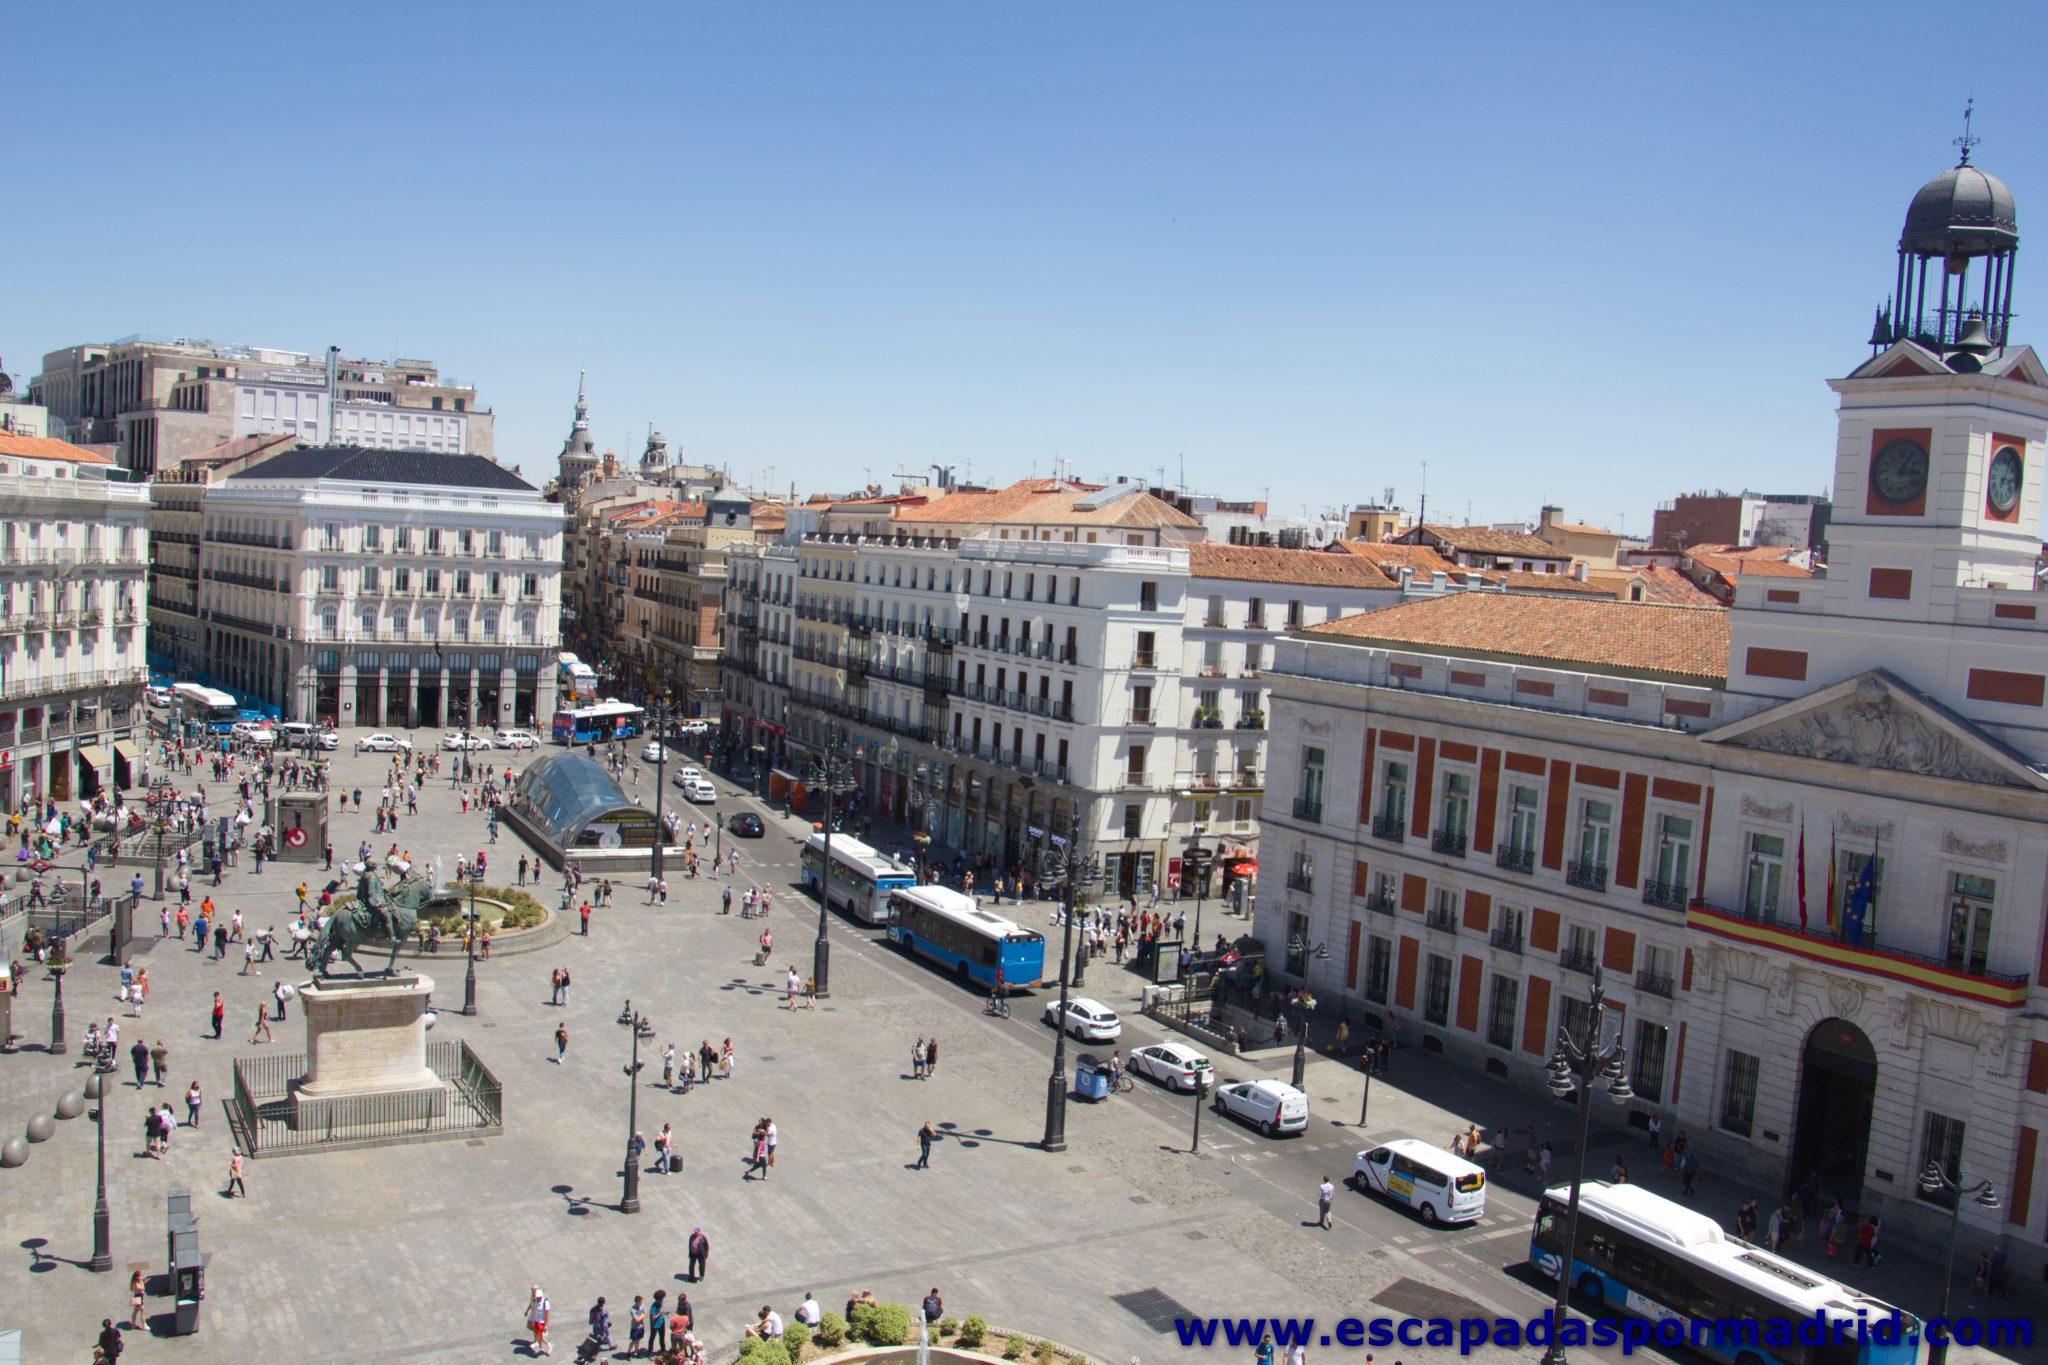 foto de la Puerta del Sol vista desde una azotea